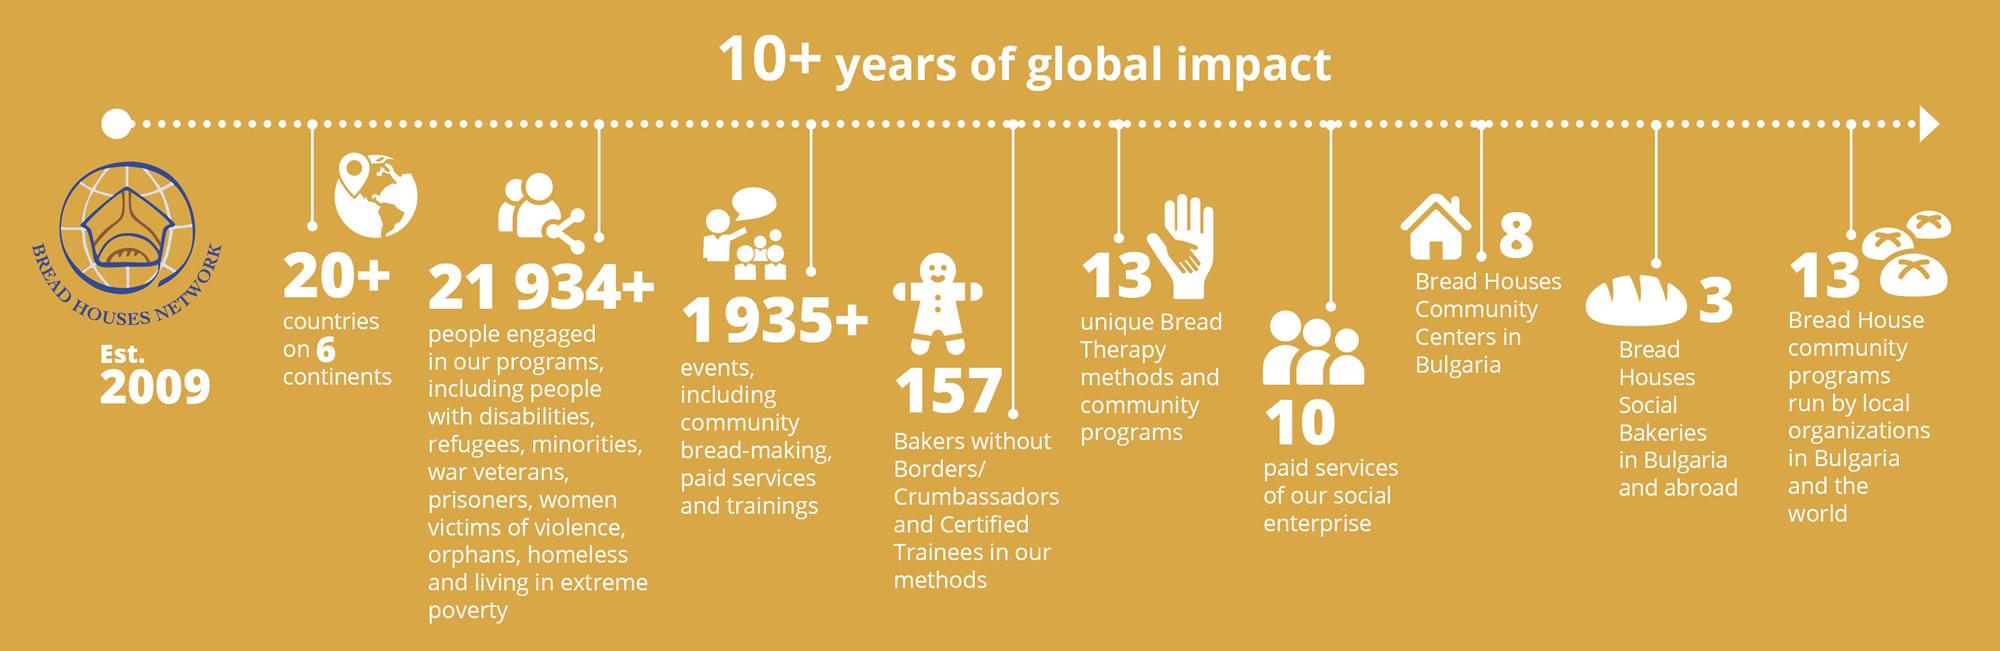 10+ years of global impact